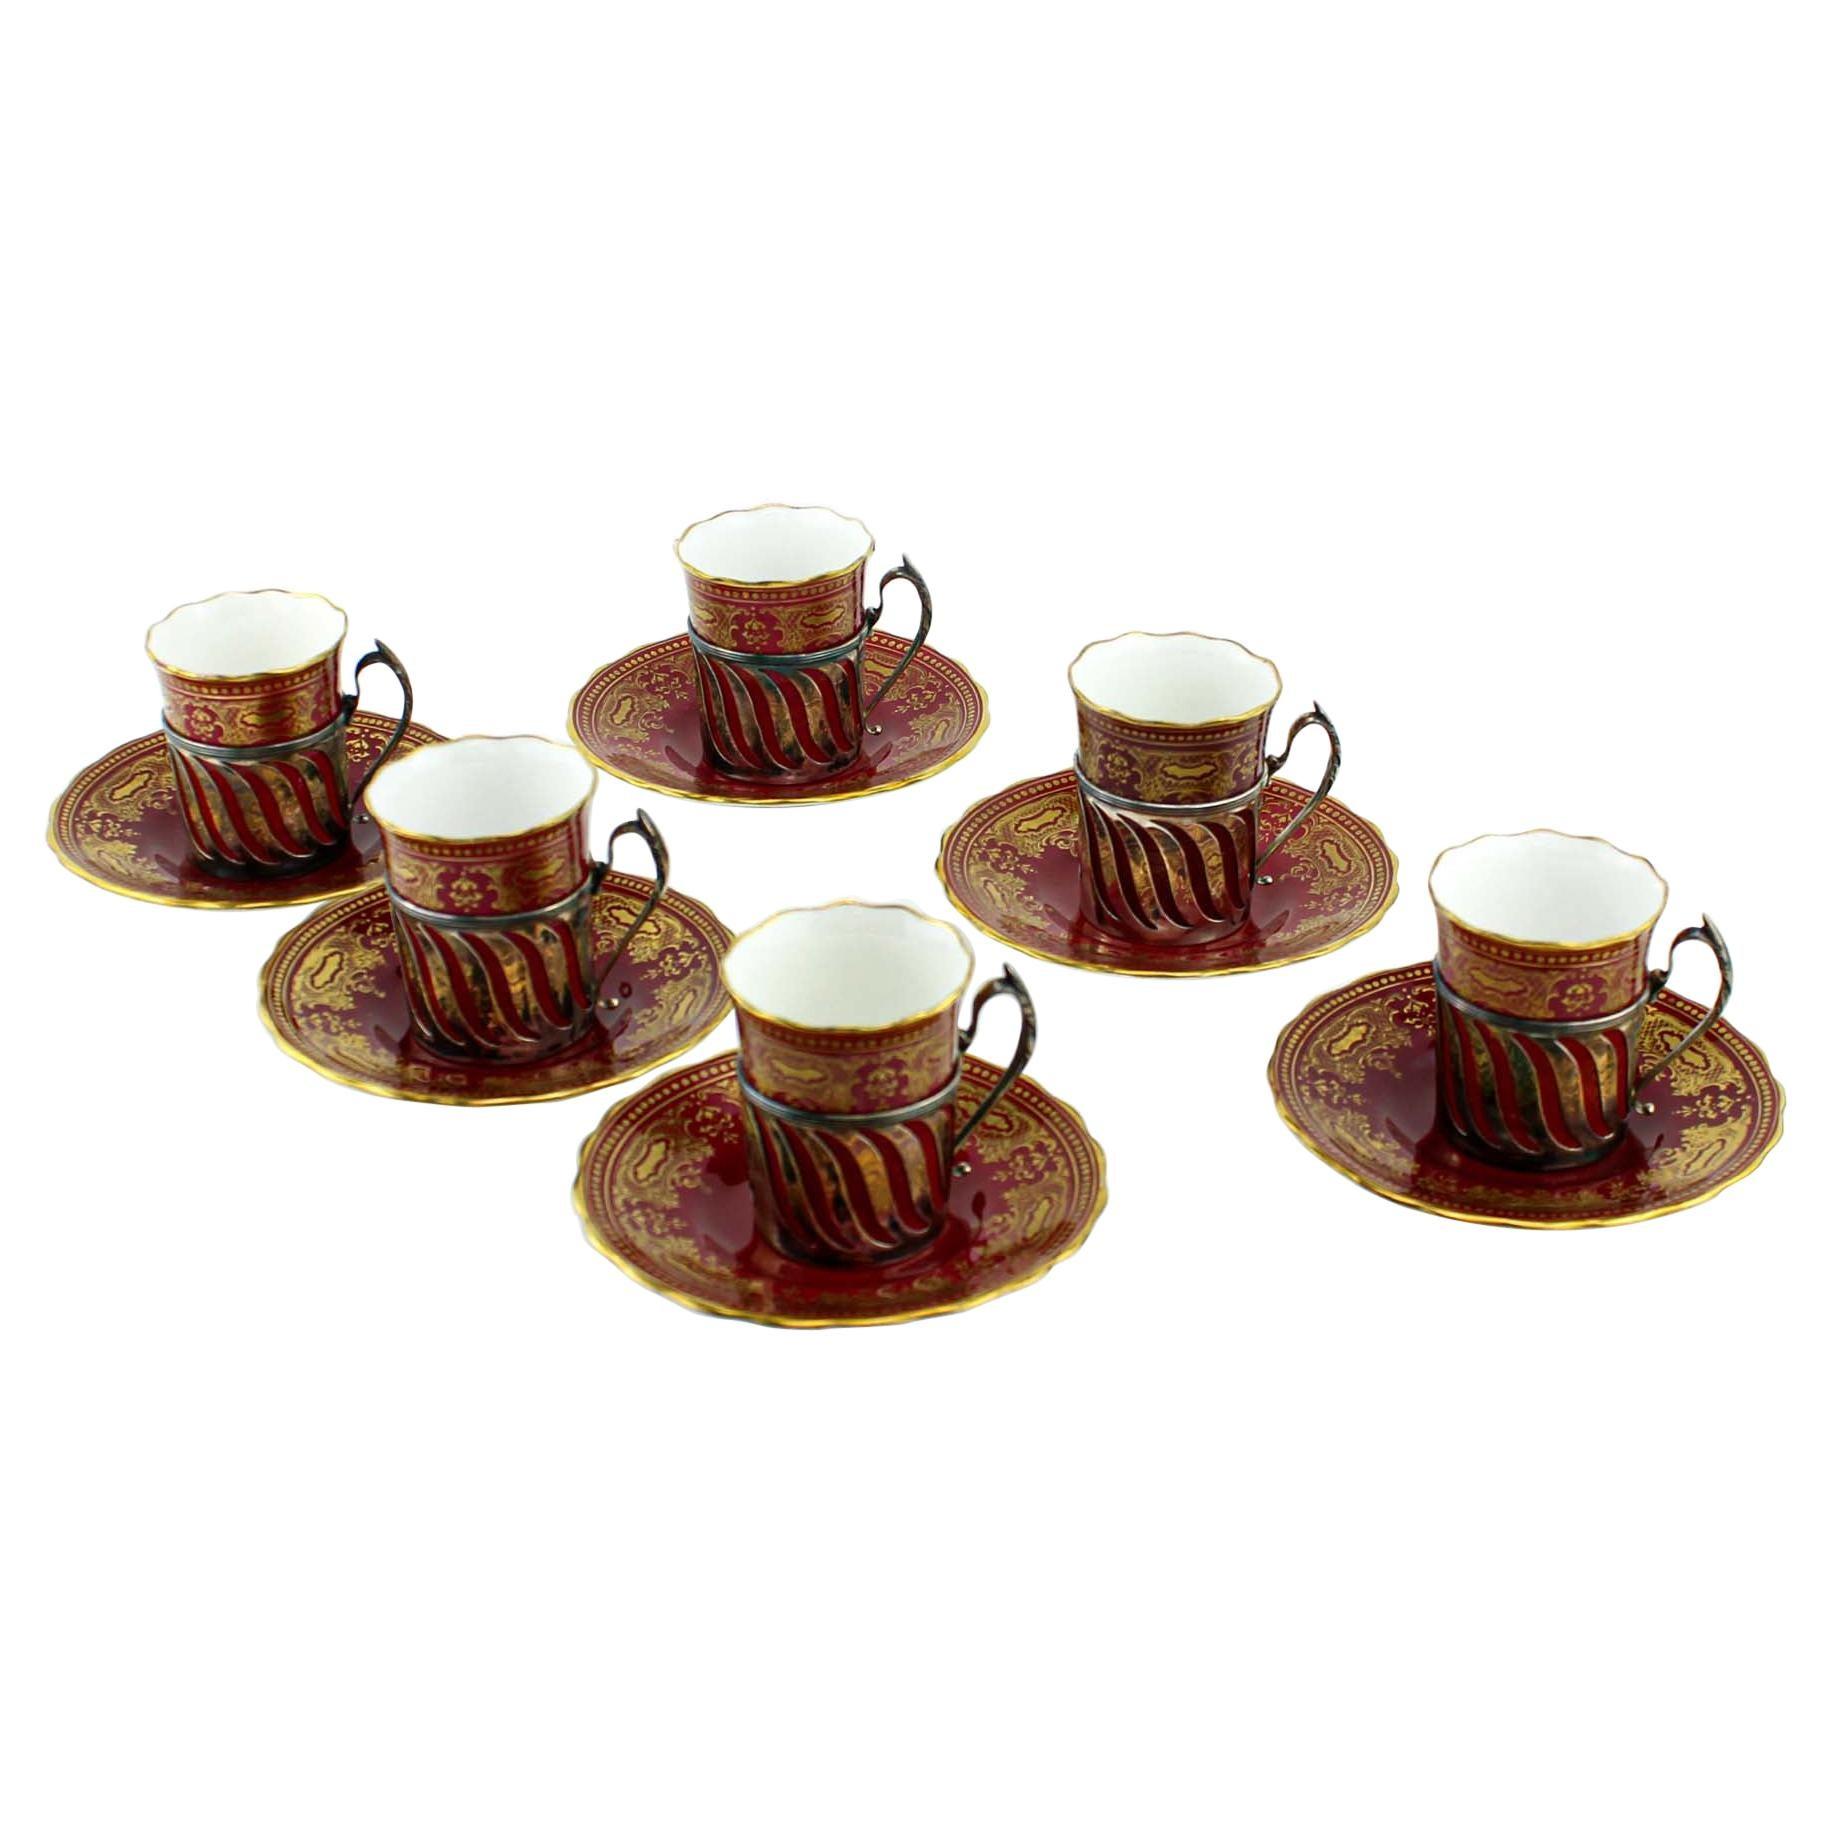 Antique Coalport Porcelain Espresso Coffee Service Set of 6 Cups and Saucers